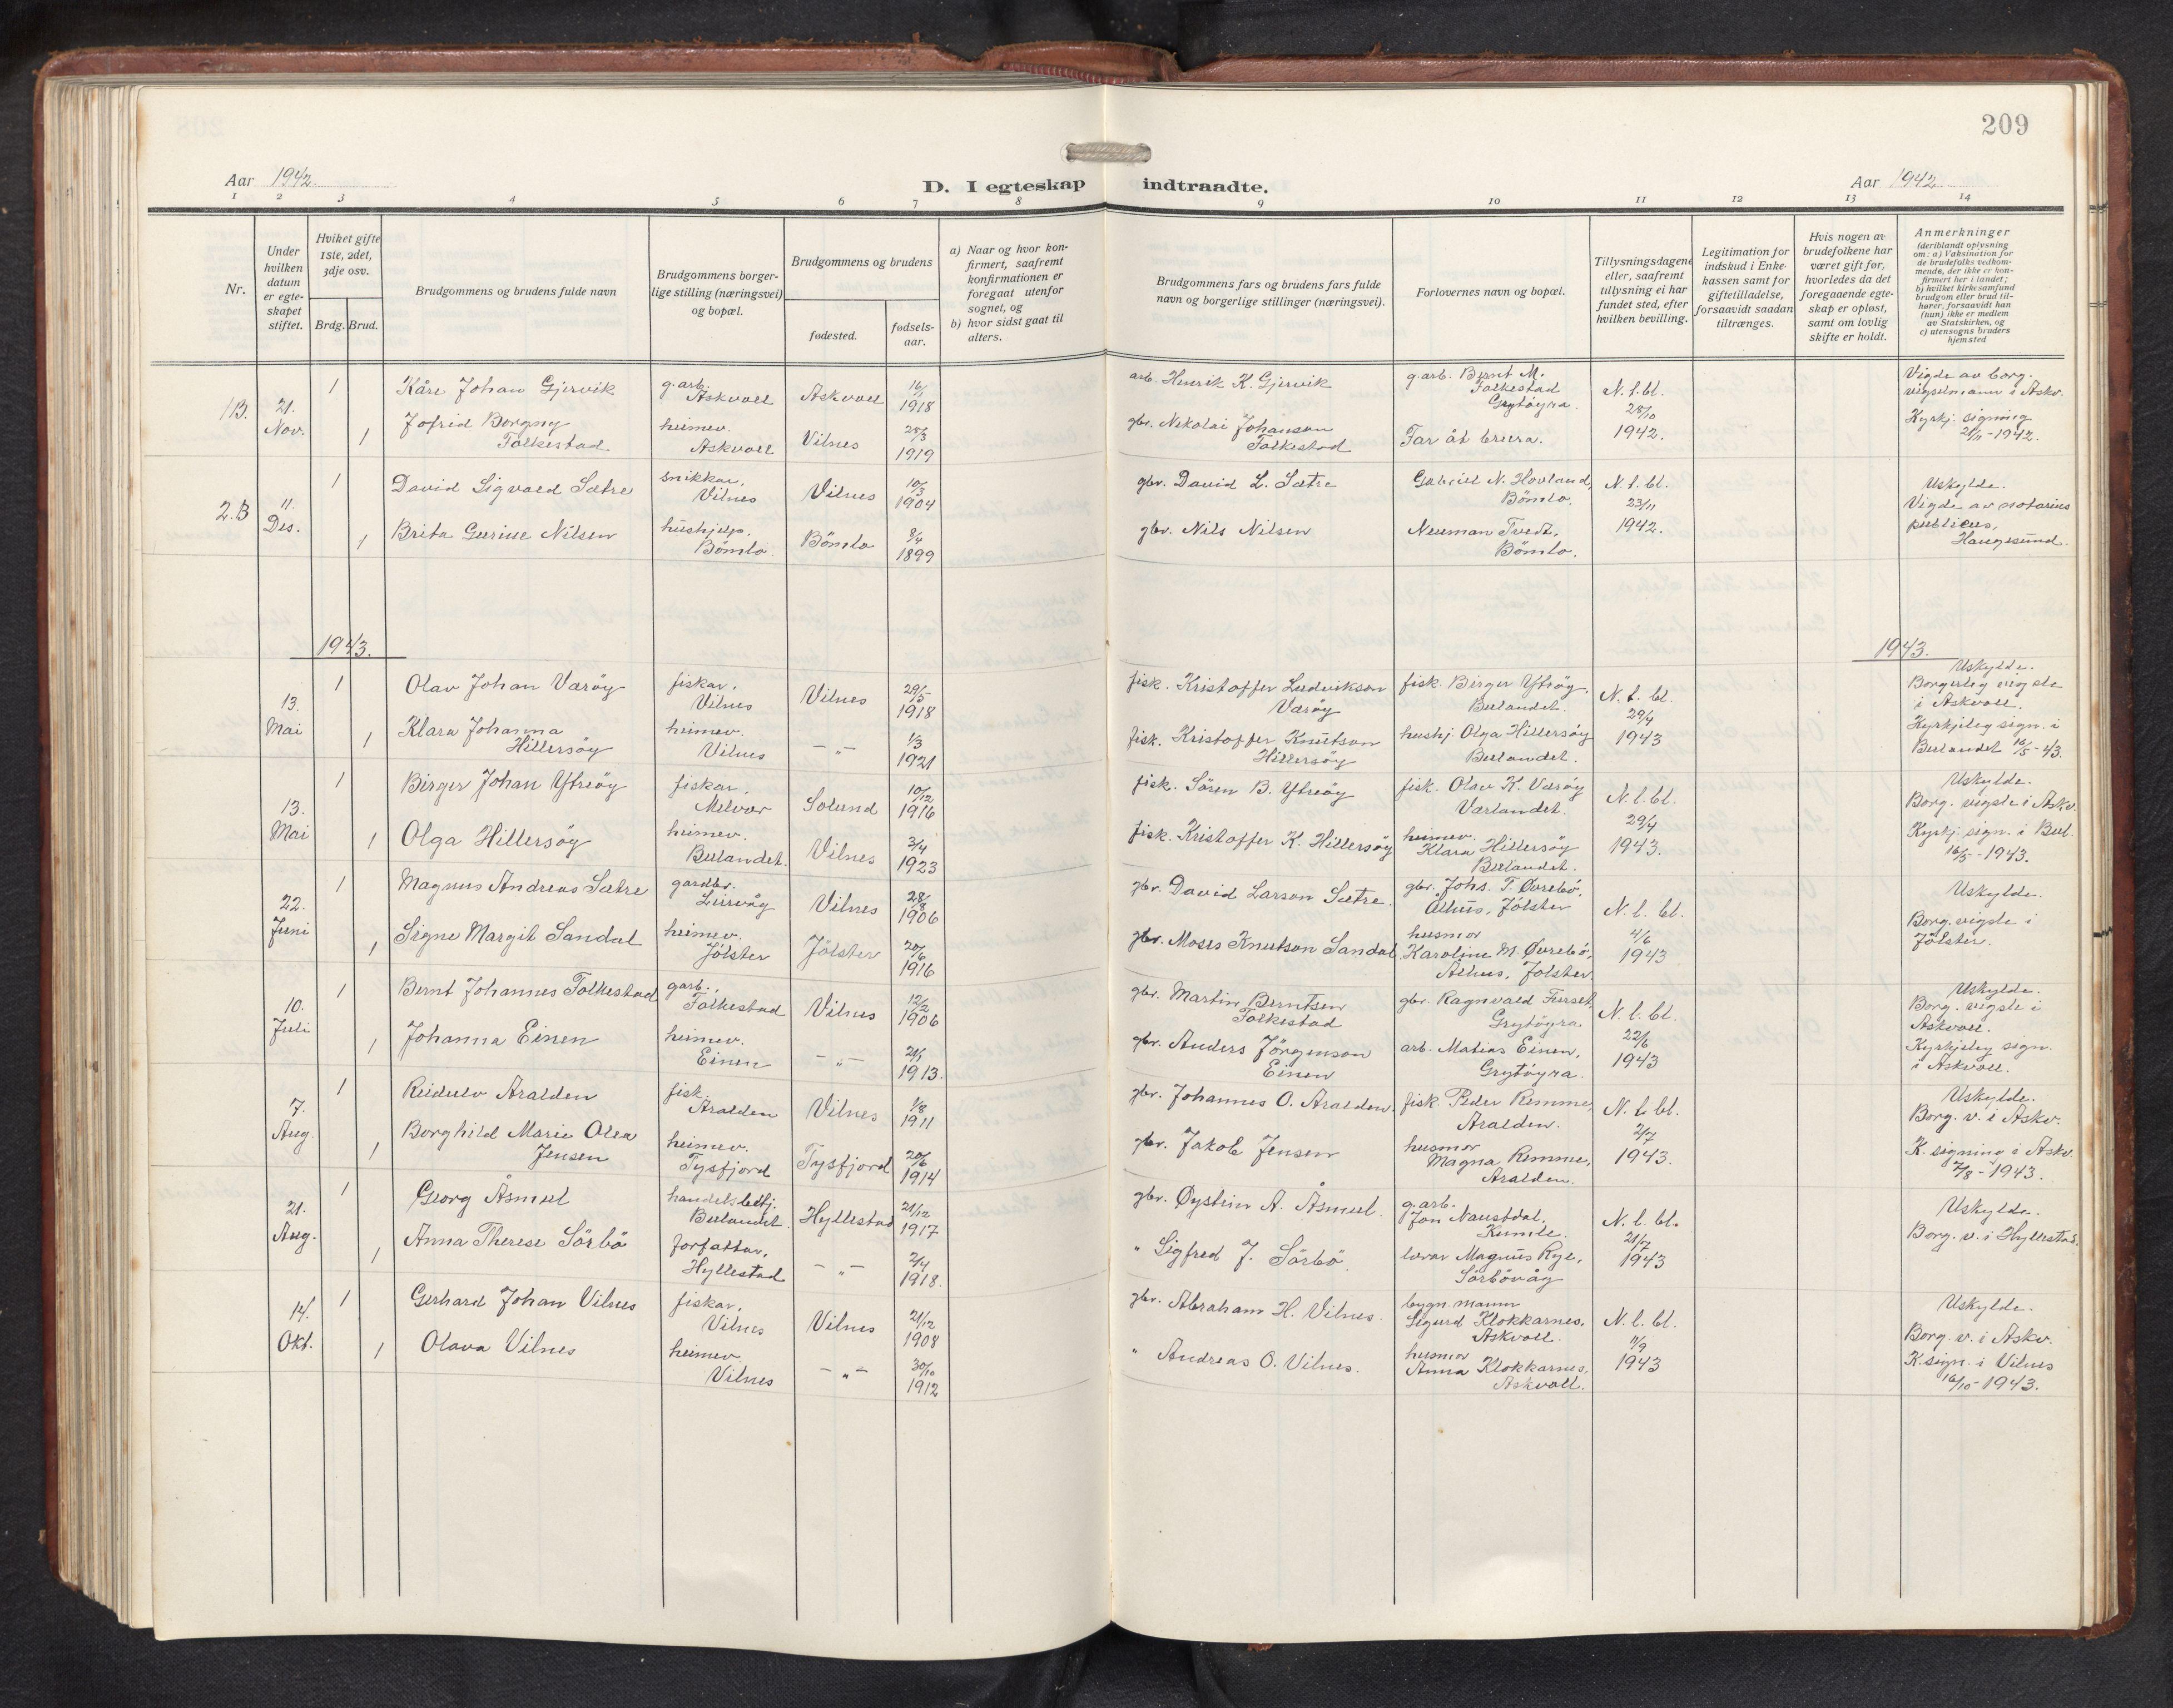 SAB, Askvoll sokneprestembete, H/Hab/Habb/L0002: Klokkerbok nr. B 2, 1910-1947, s. 208b-209a